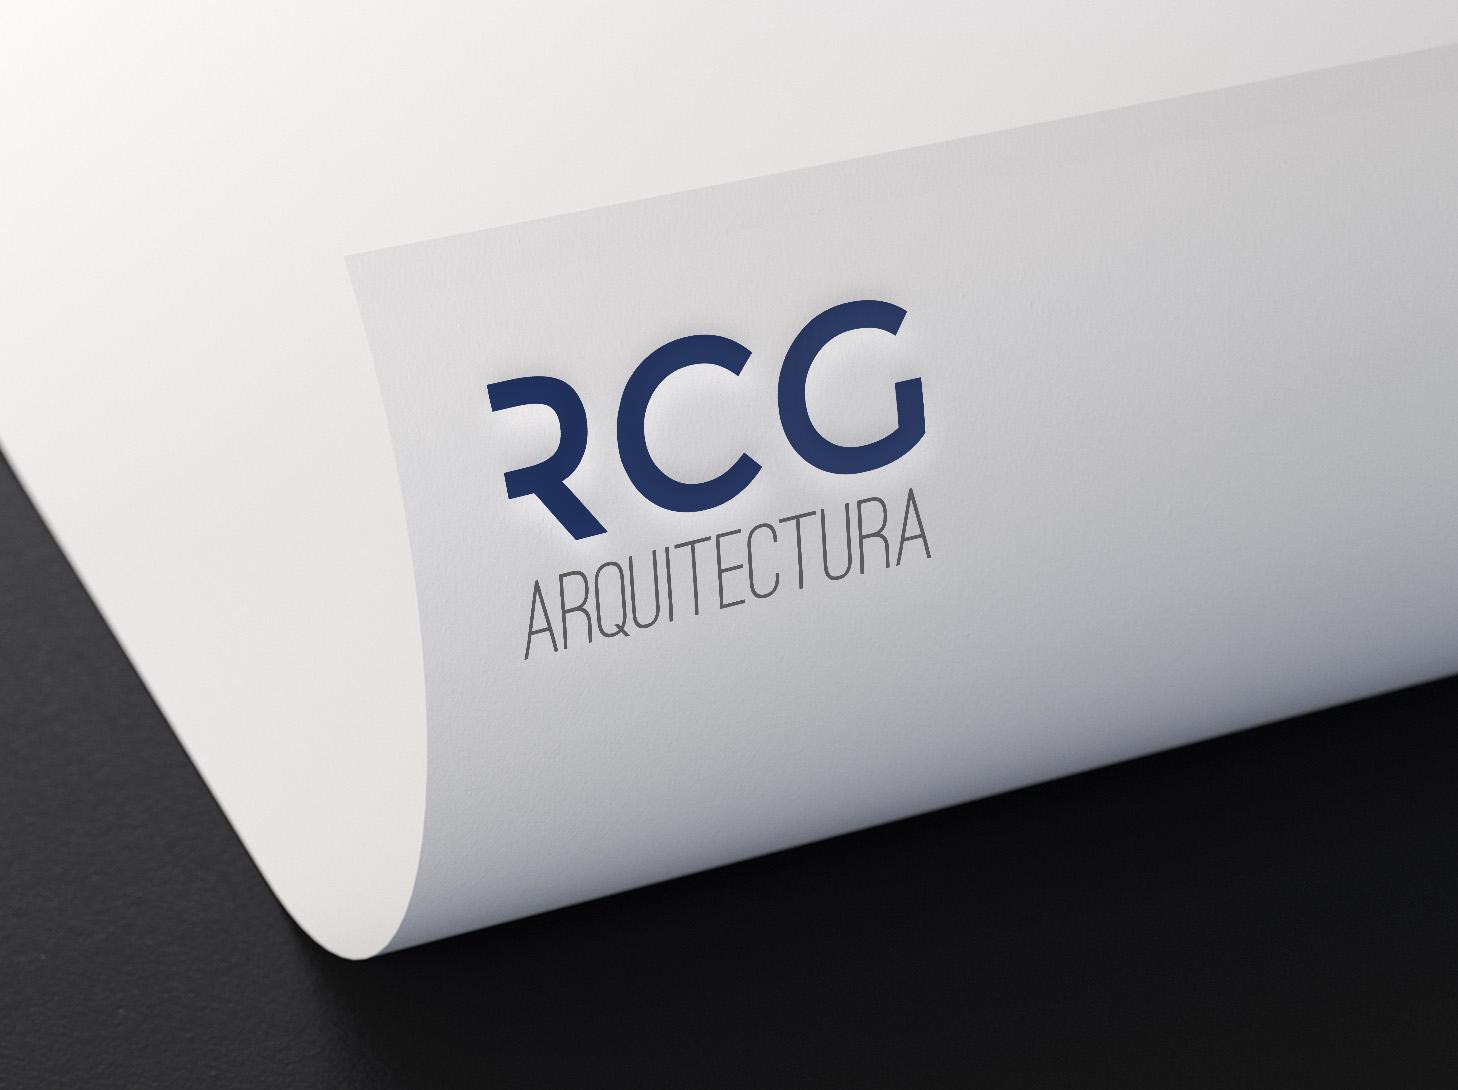 RCG Arquitectura - #identity #web